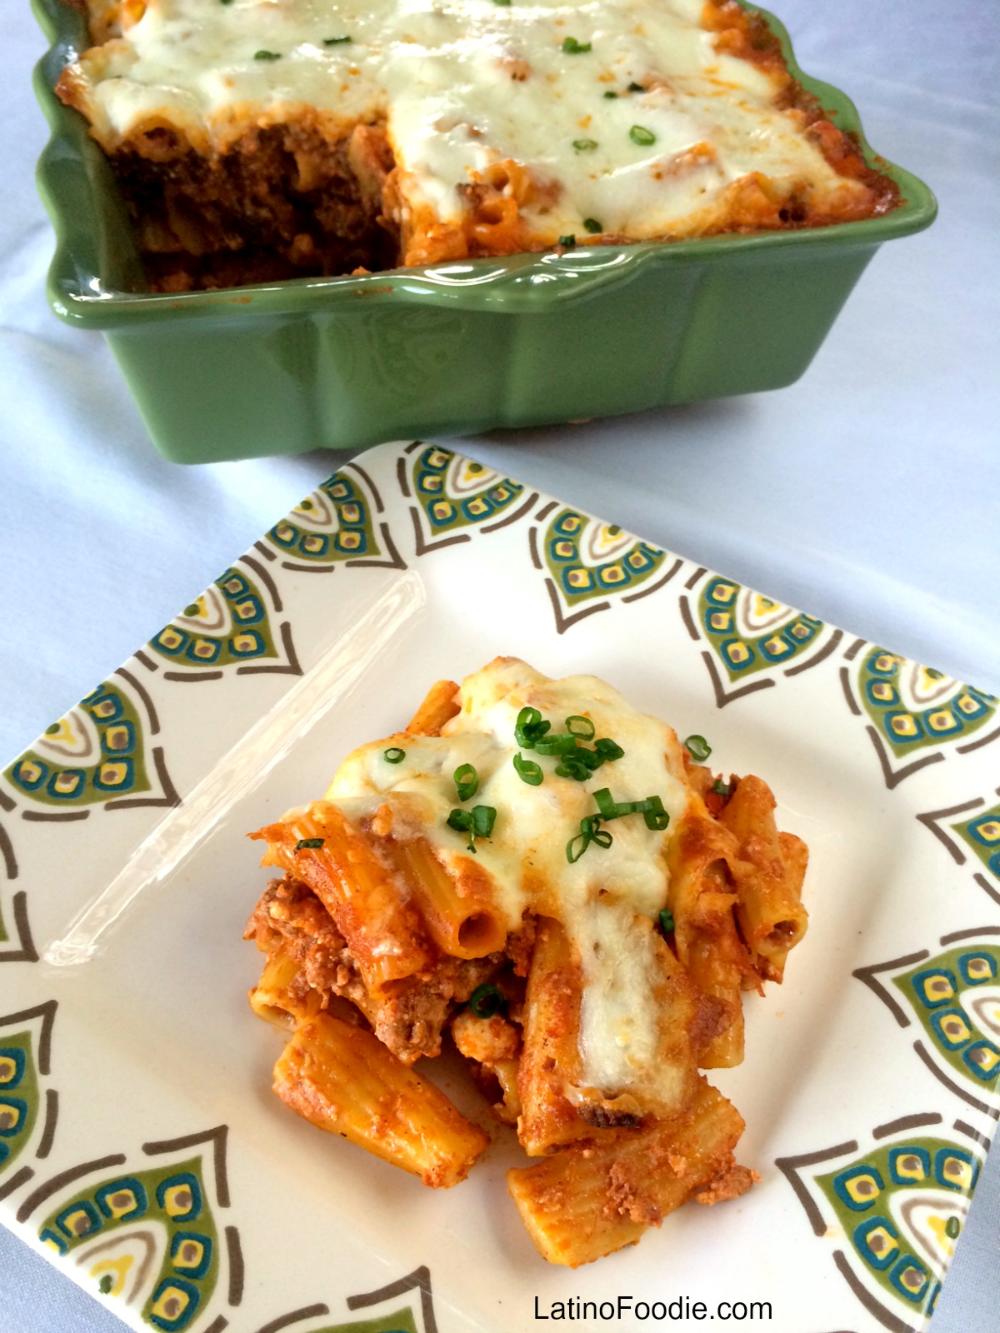 BEEF AND CHORIZO BAKED PASTA WITH TOMATO CREAM SAUCE #Saucesome - Latino Foodie #tomatocreamsauces